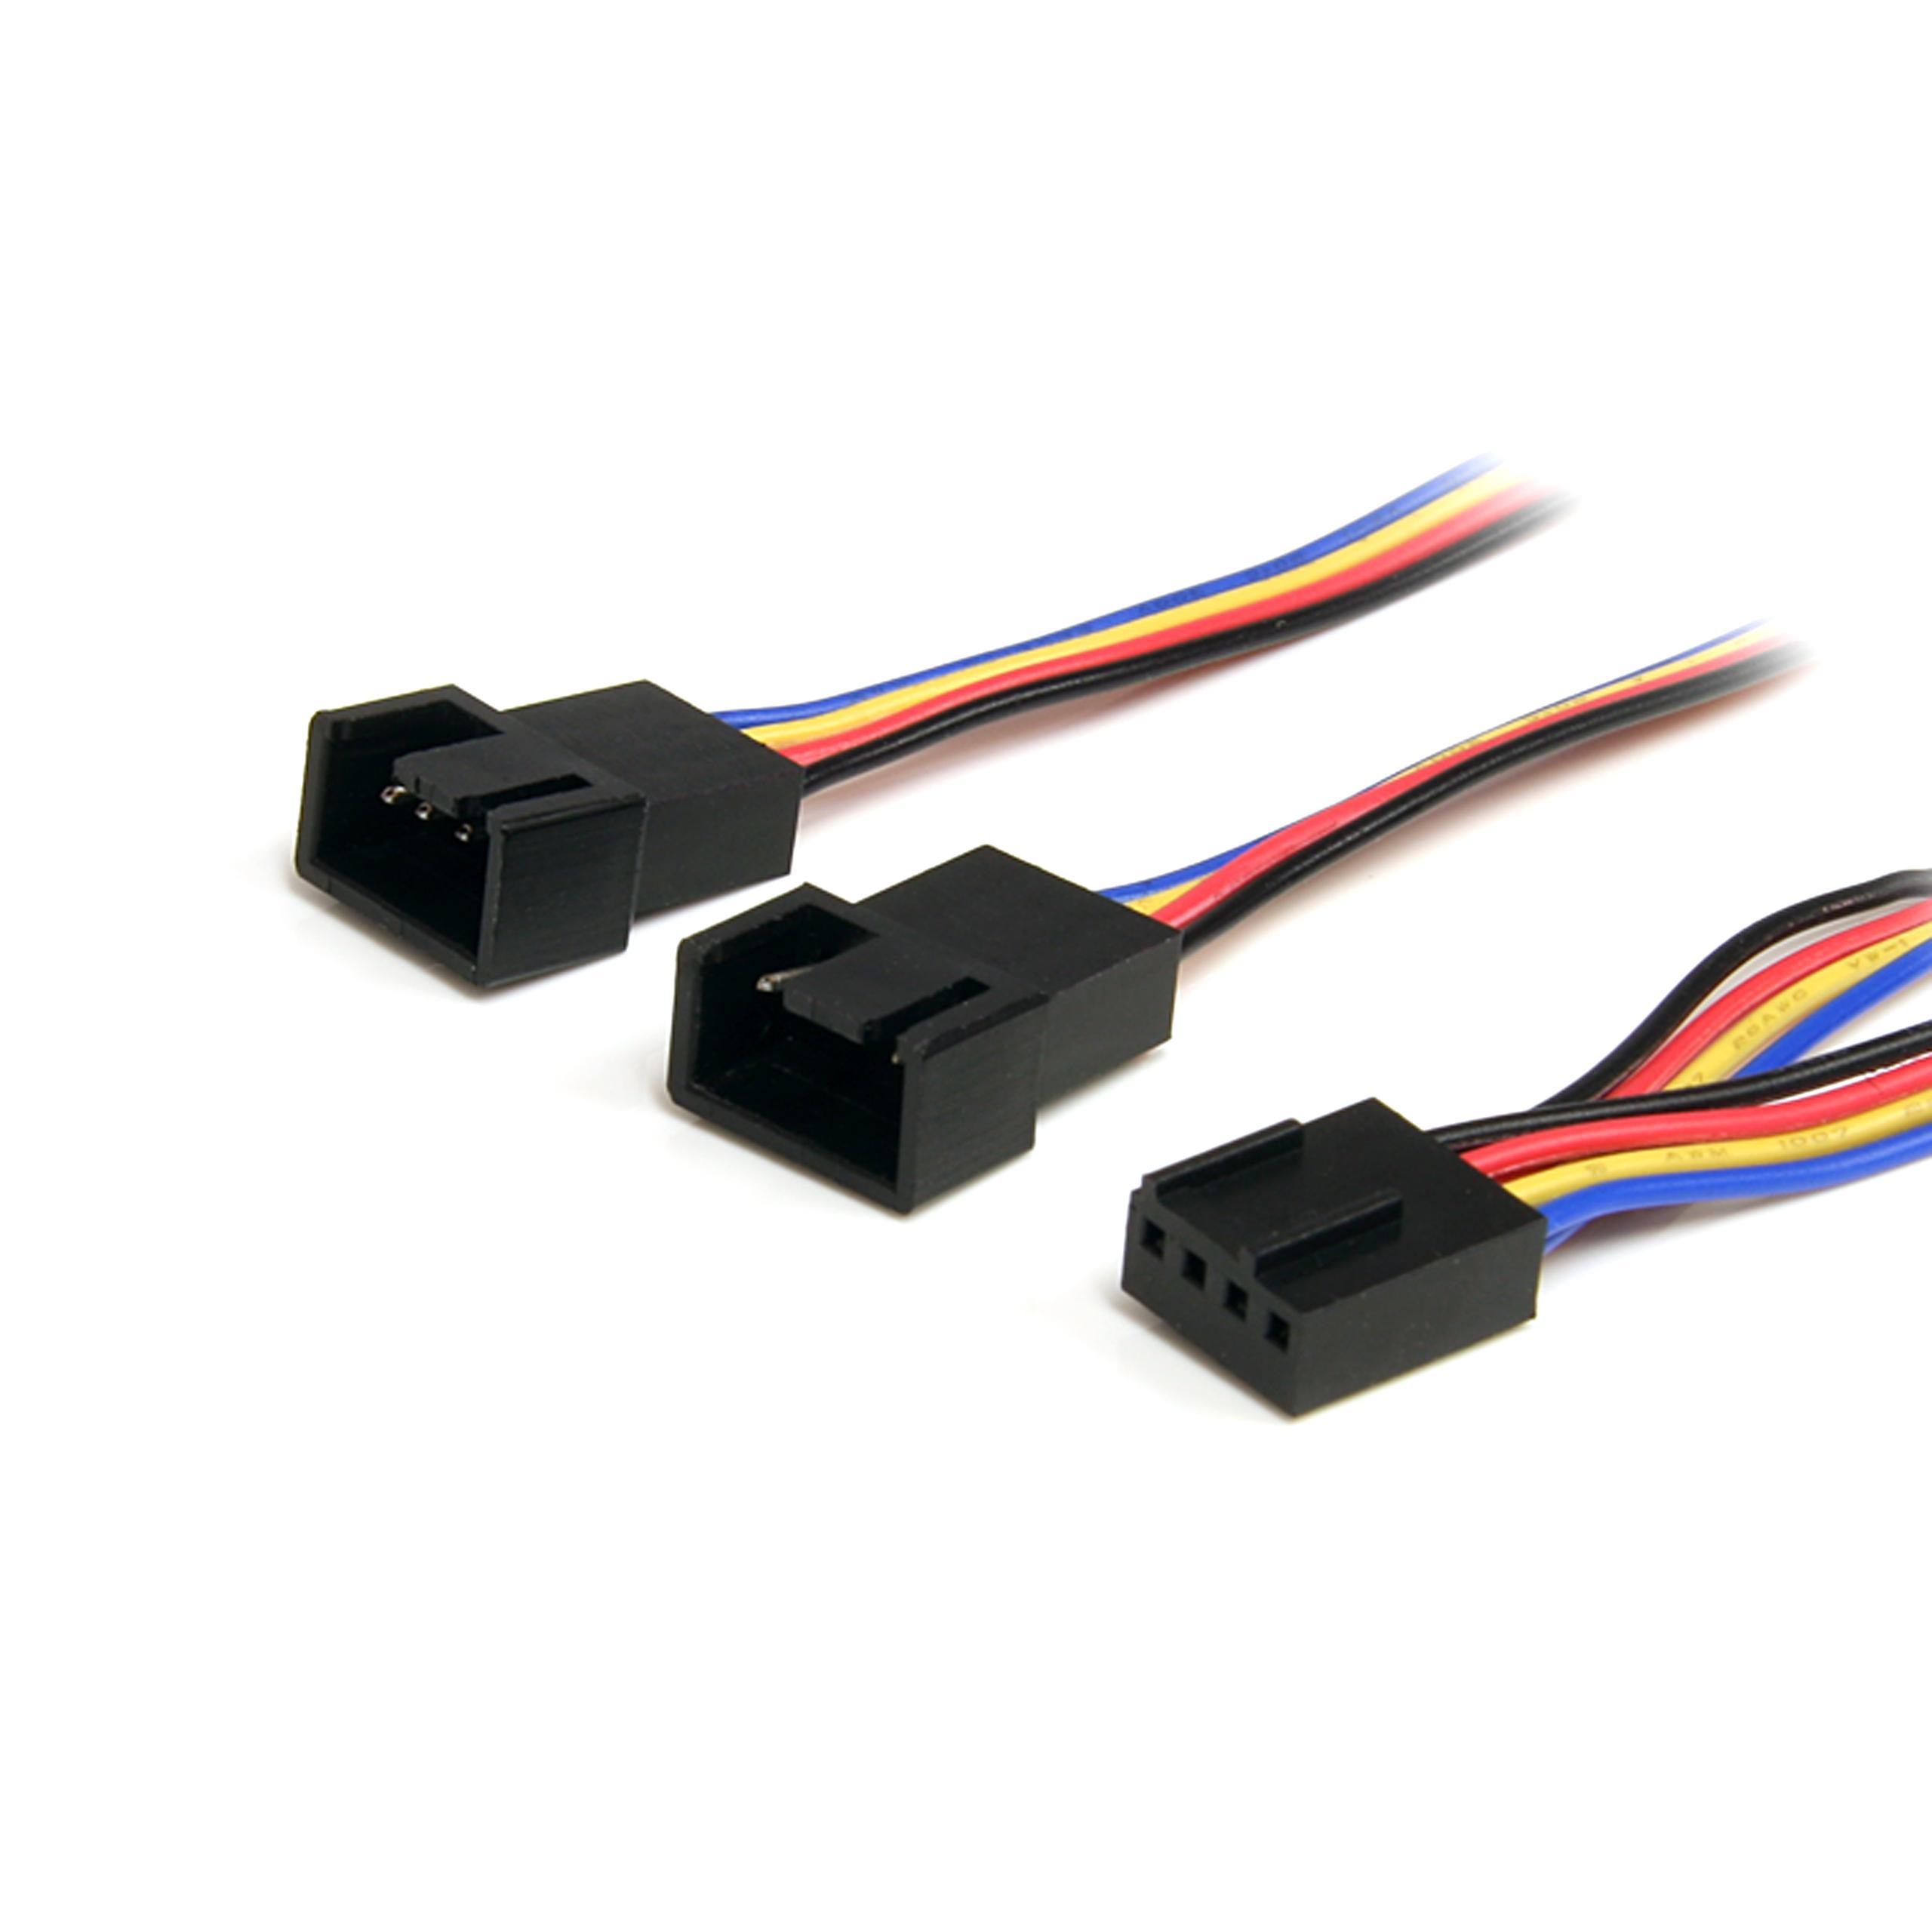 StarTech FAN4SPLIT12 - Cable divisor de 0.3 m (PWM 4 pines), alimentación ventilador fan placa base macho a hembra: Amazon.es: Informática